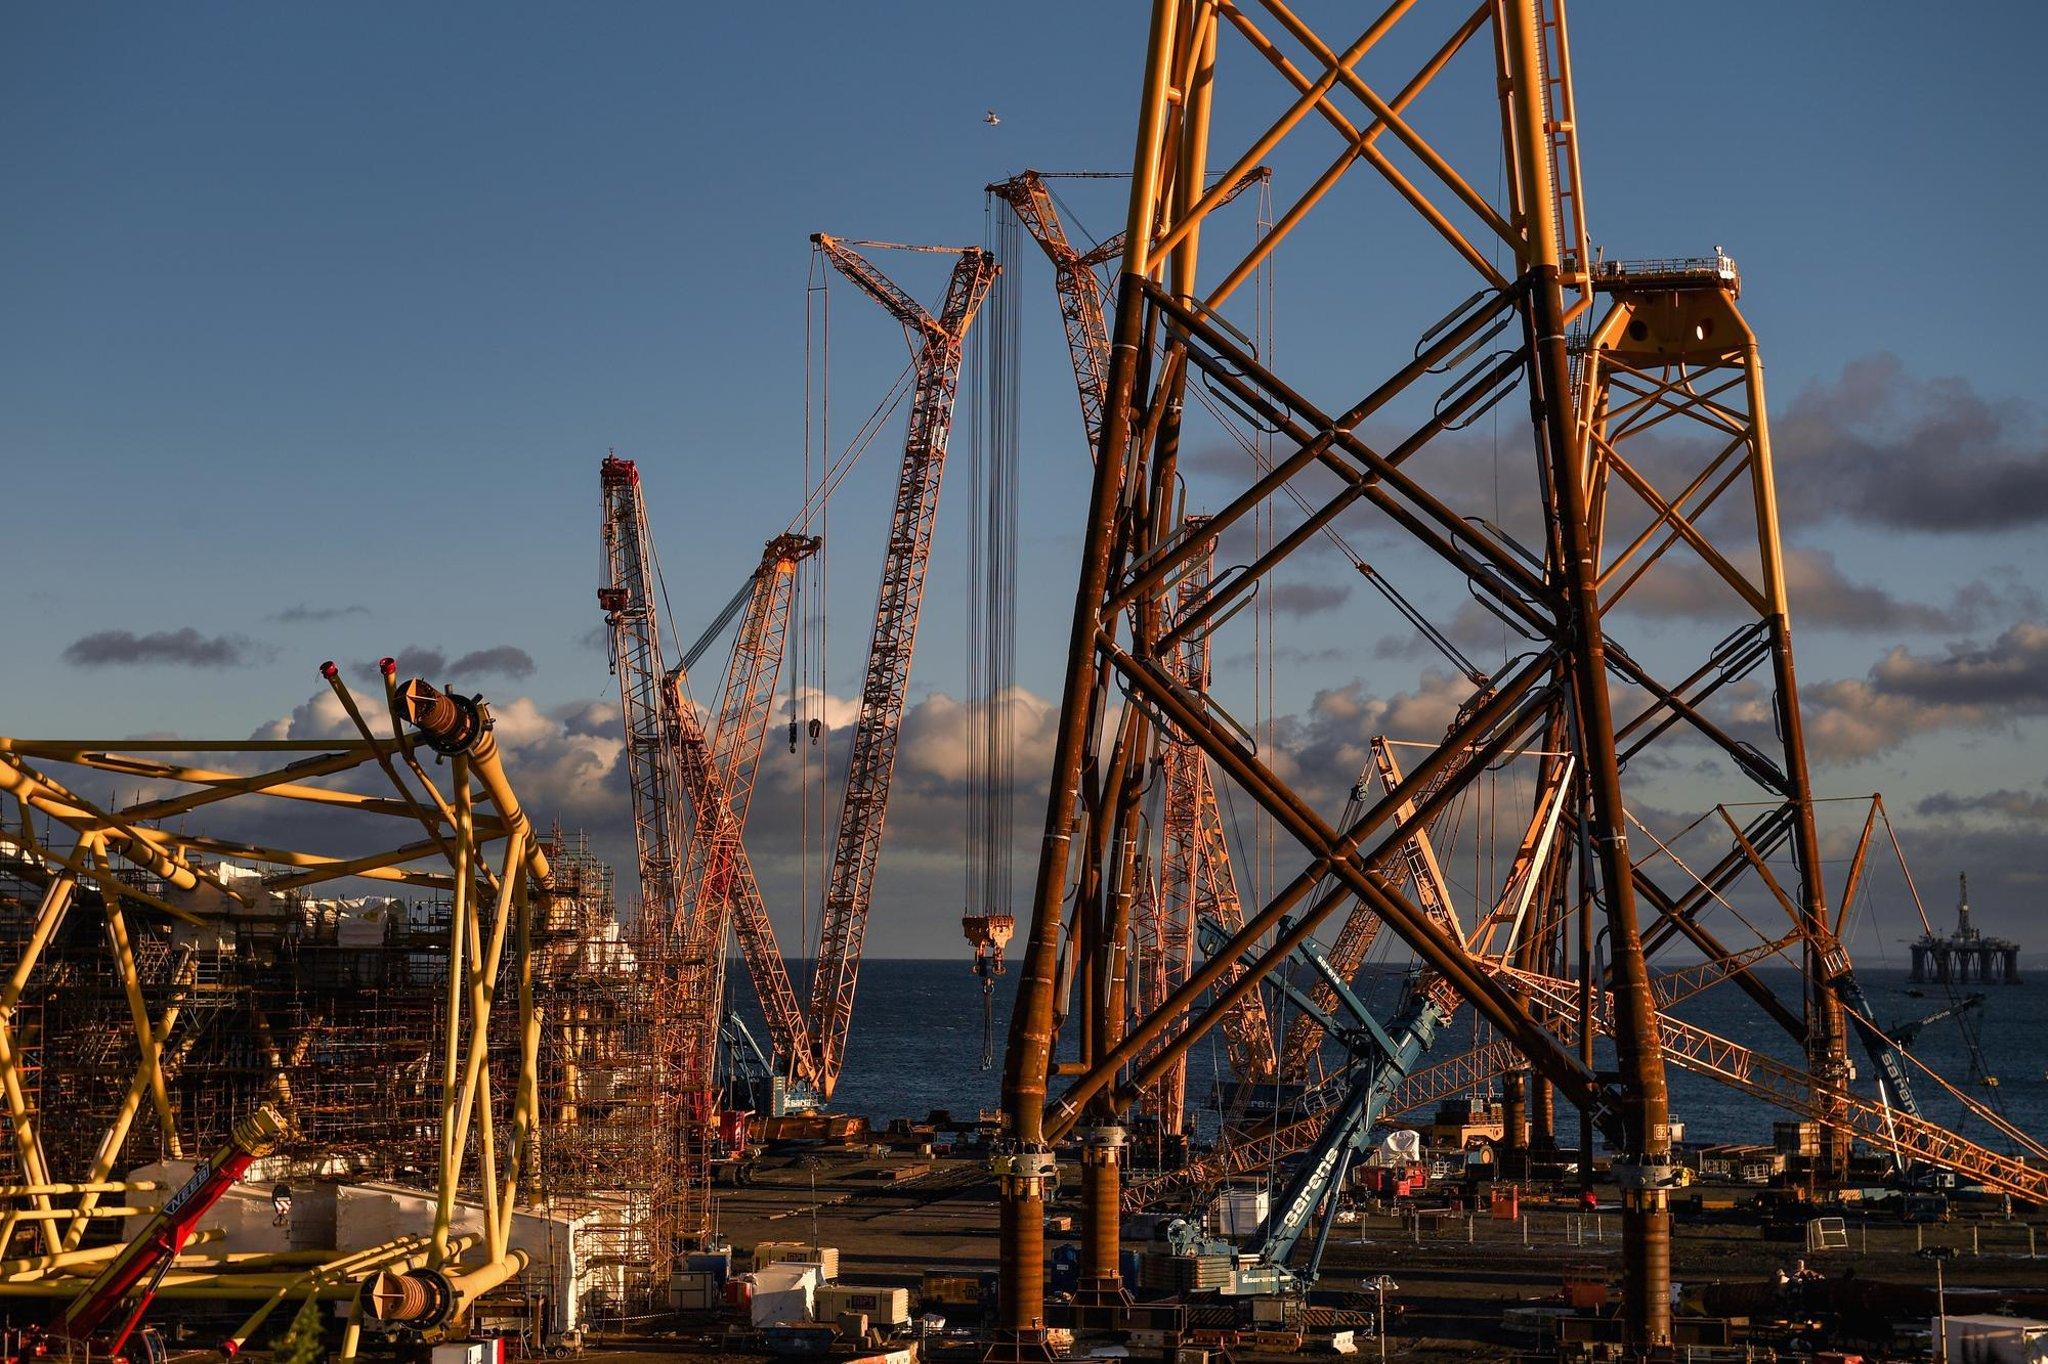 Energi terbarukan menciptakan ledakan lapangan kerja di Inggris Utara, jadi mengapa tidak Skotlandia?  – Kenny MacAskill MP